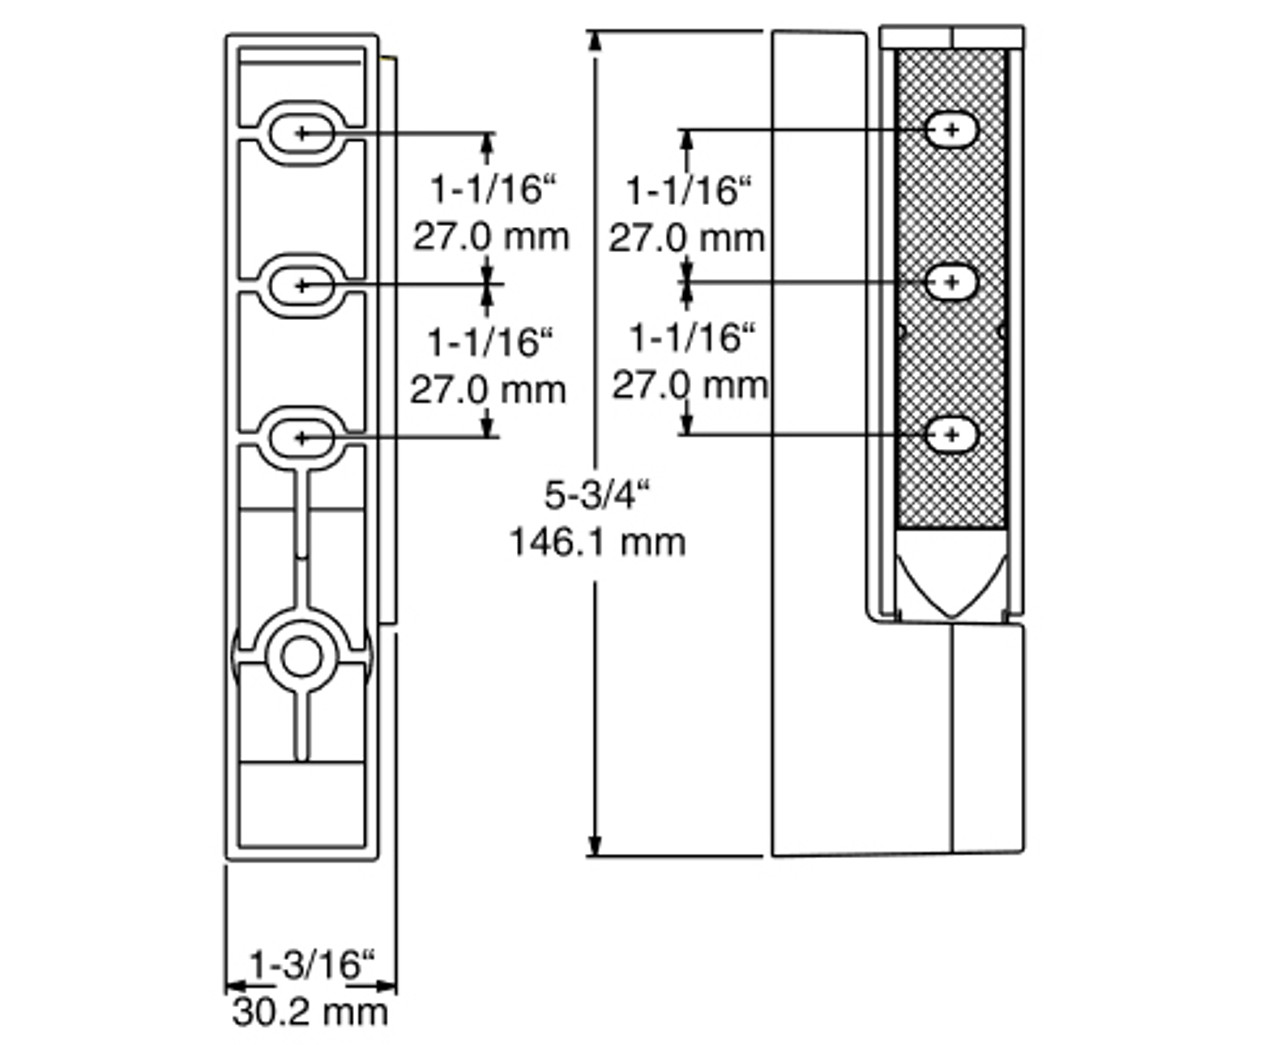 Kason-1467R-Double-Adjustable-Hinge-diagram-11467R00014